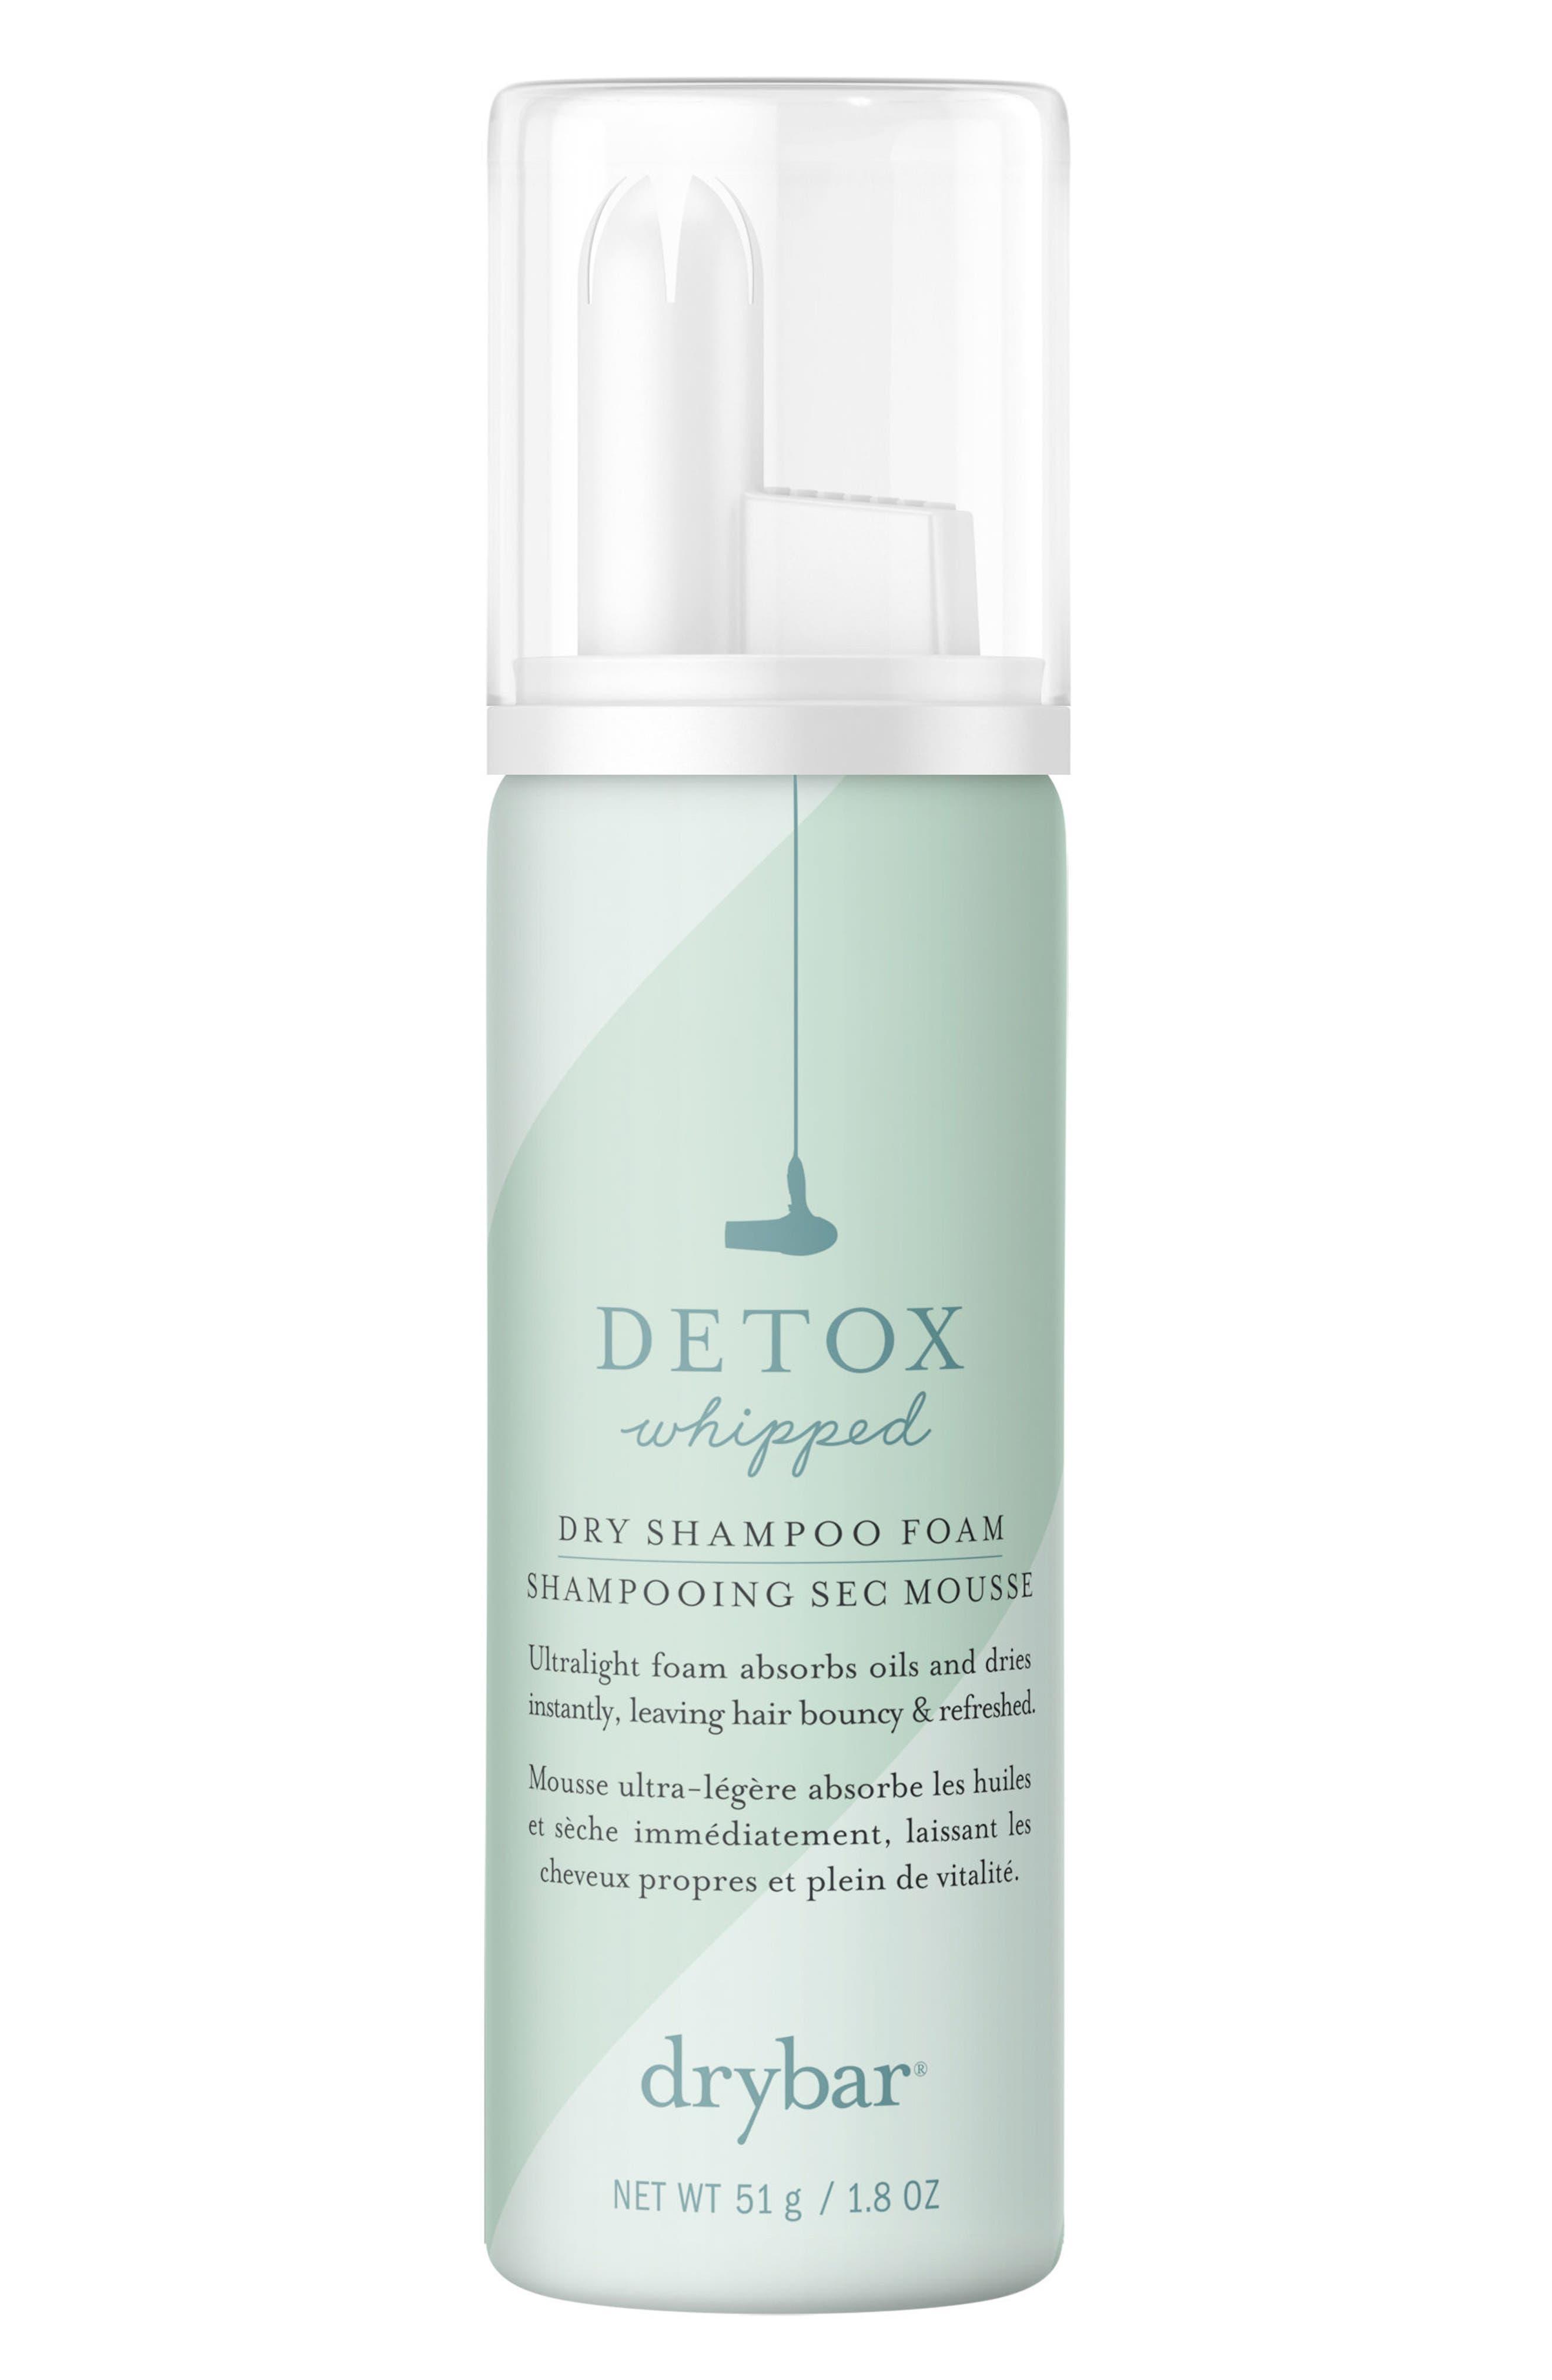 DRYBAR, Detox Whipped Dry Shampoo Foam, Alternate thumbnail 2, color, NO COLOR